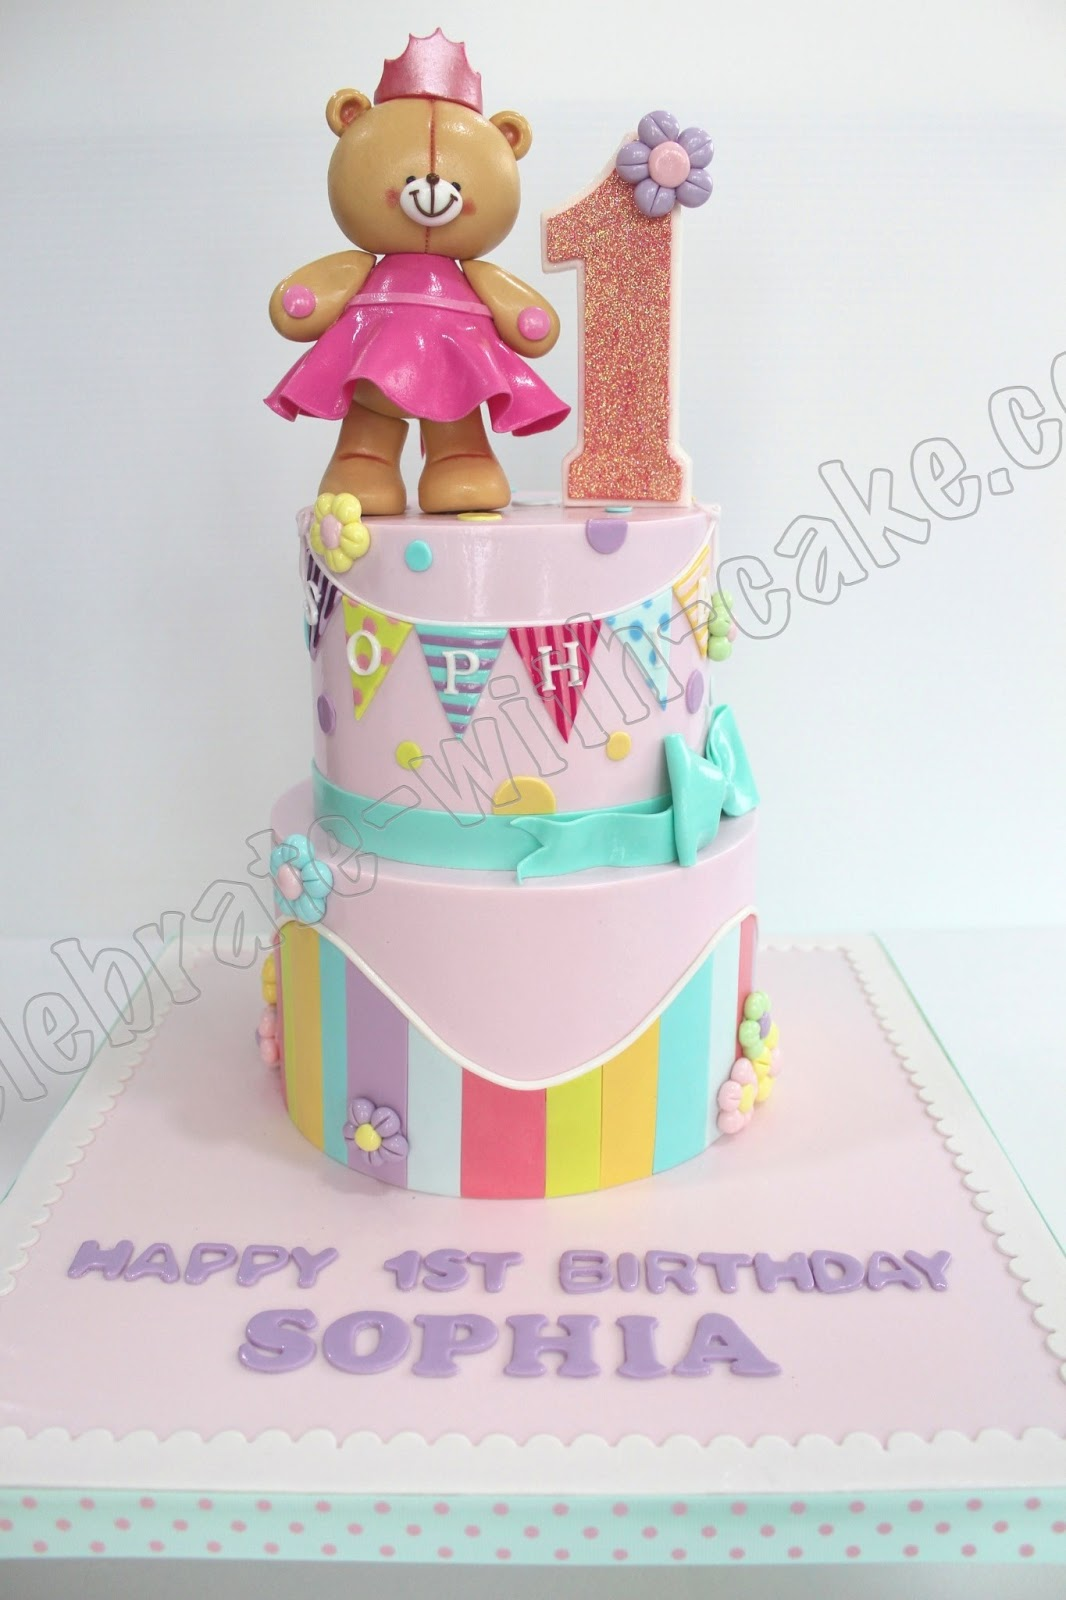 celebrate with cake 1st birthday baby bear tier cake